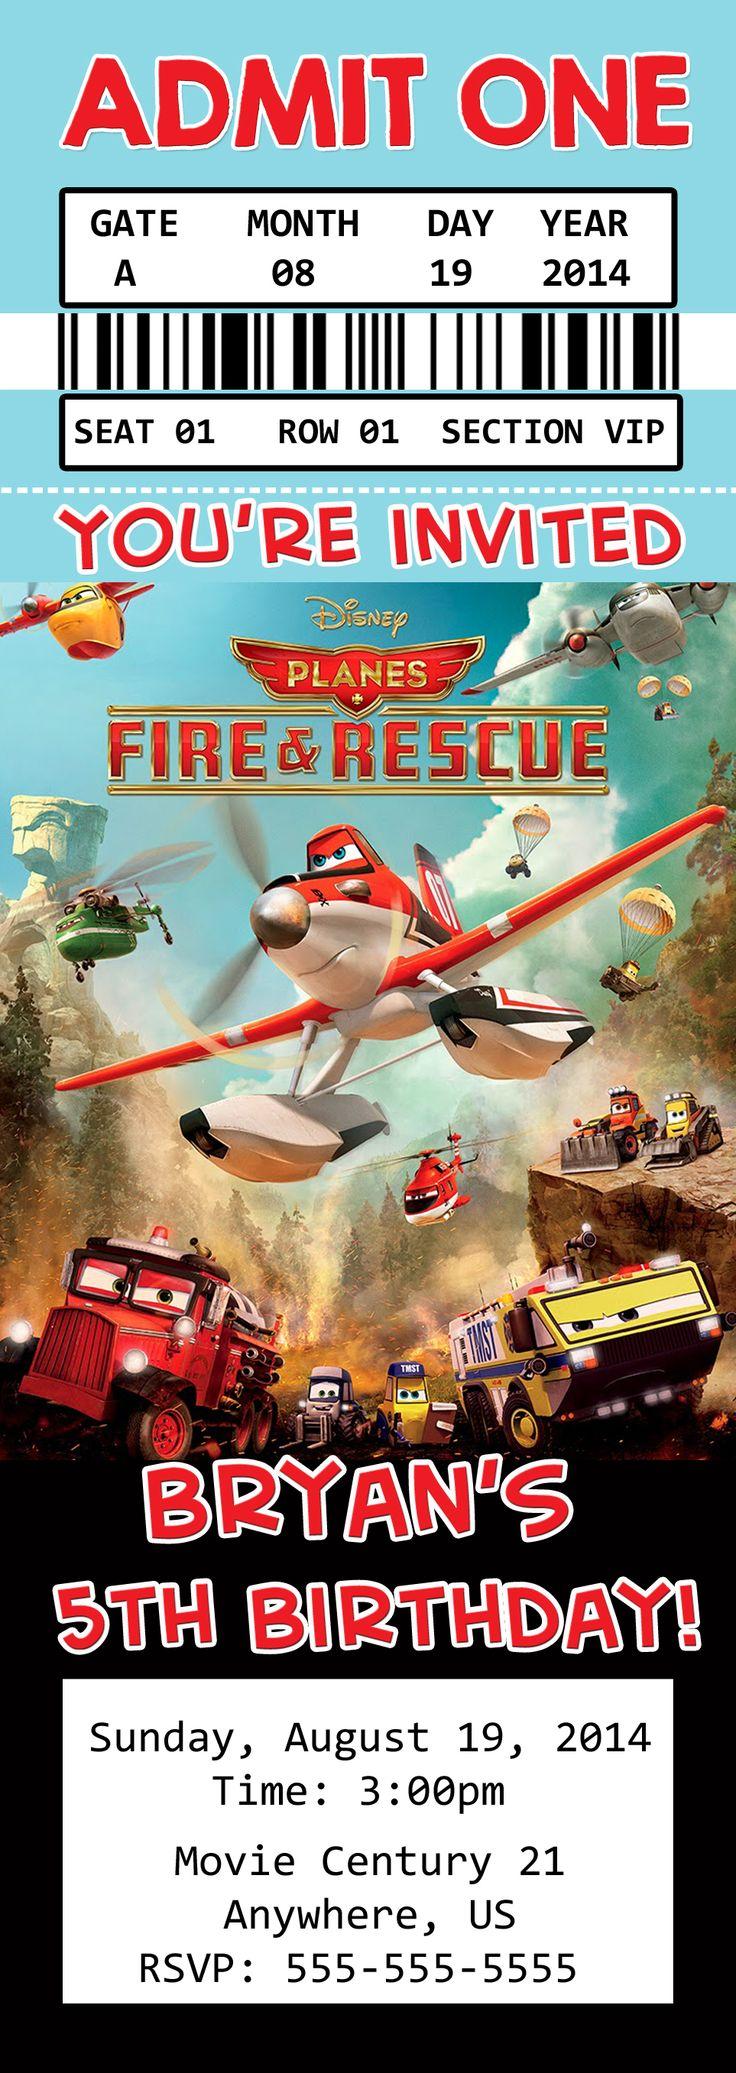 Disney Planes Fire and Rescue Movie Birthday Ticket Invitation $8.99